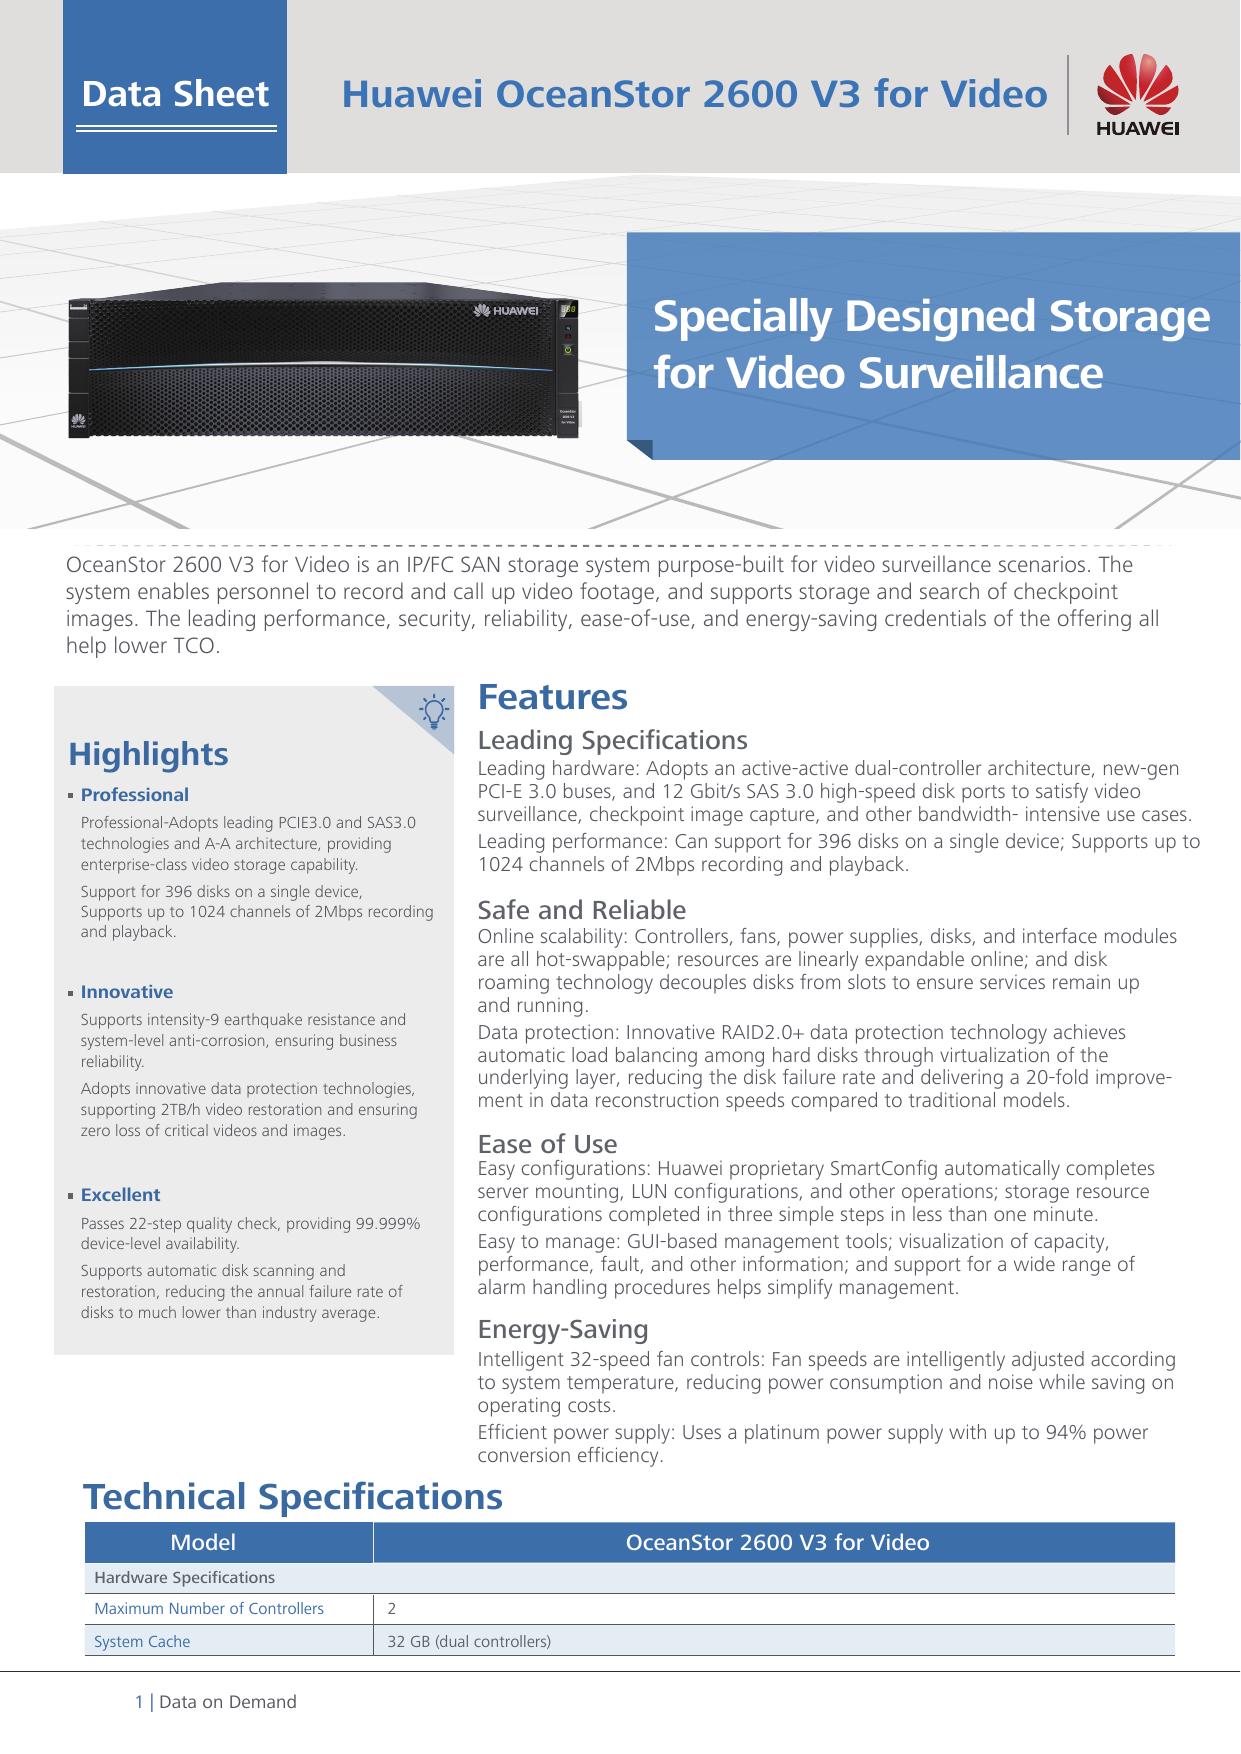 Huawei OceanStor 2600 V3 Storage System (Video Surveillance